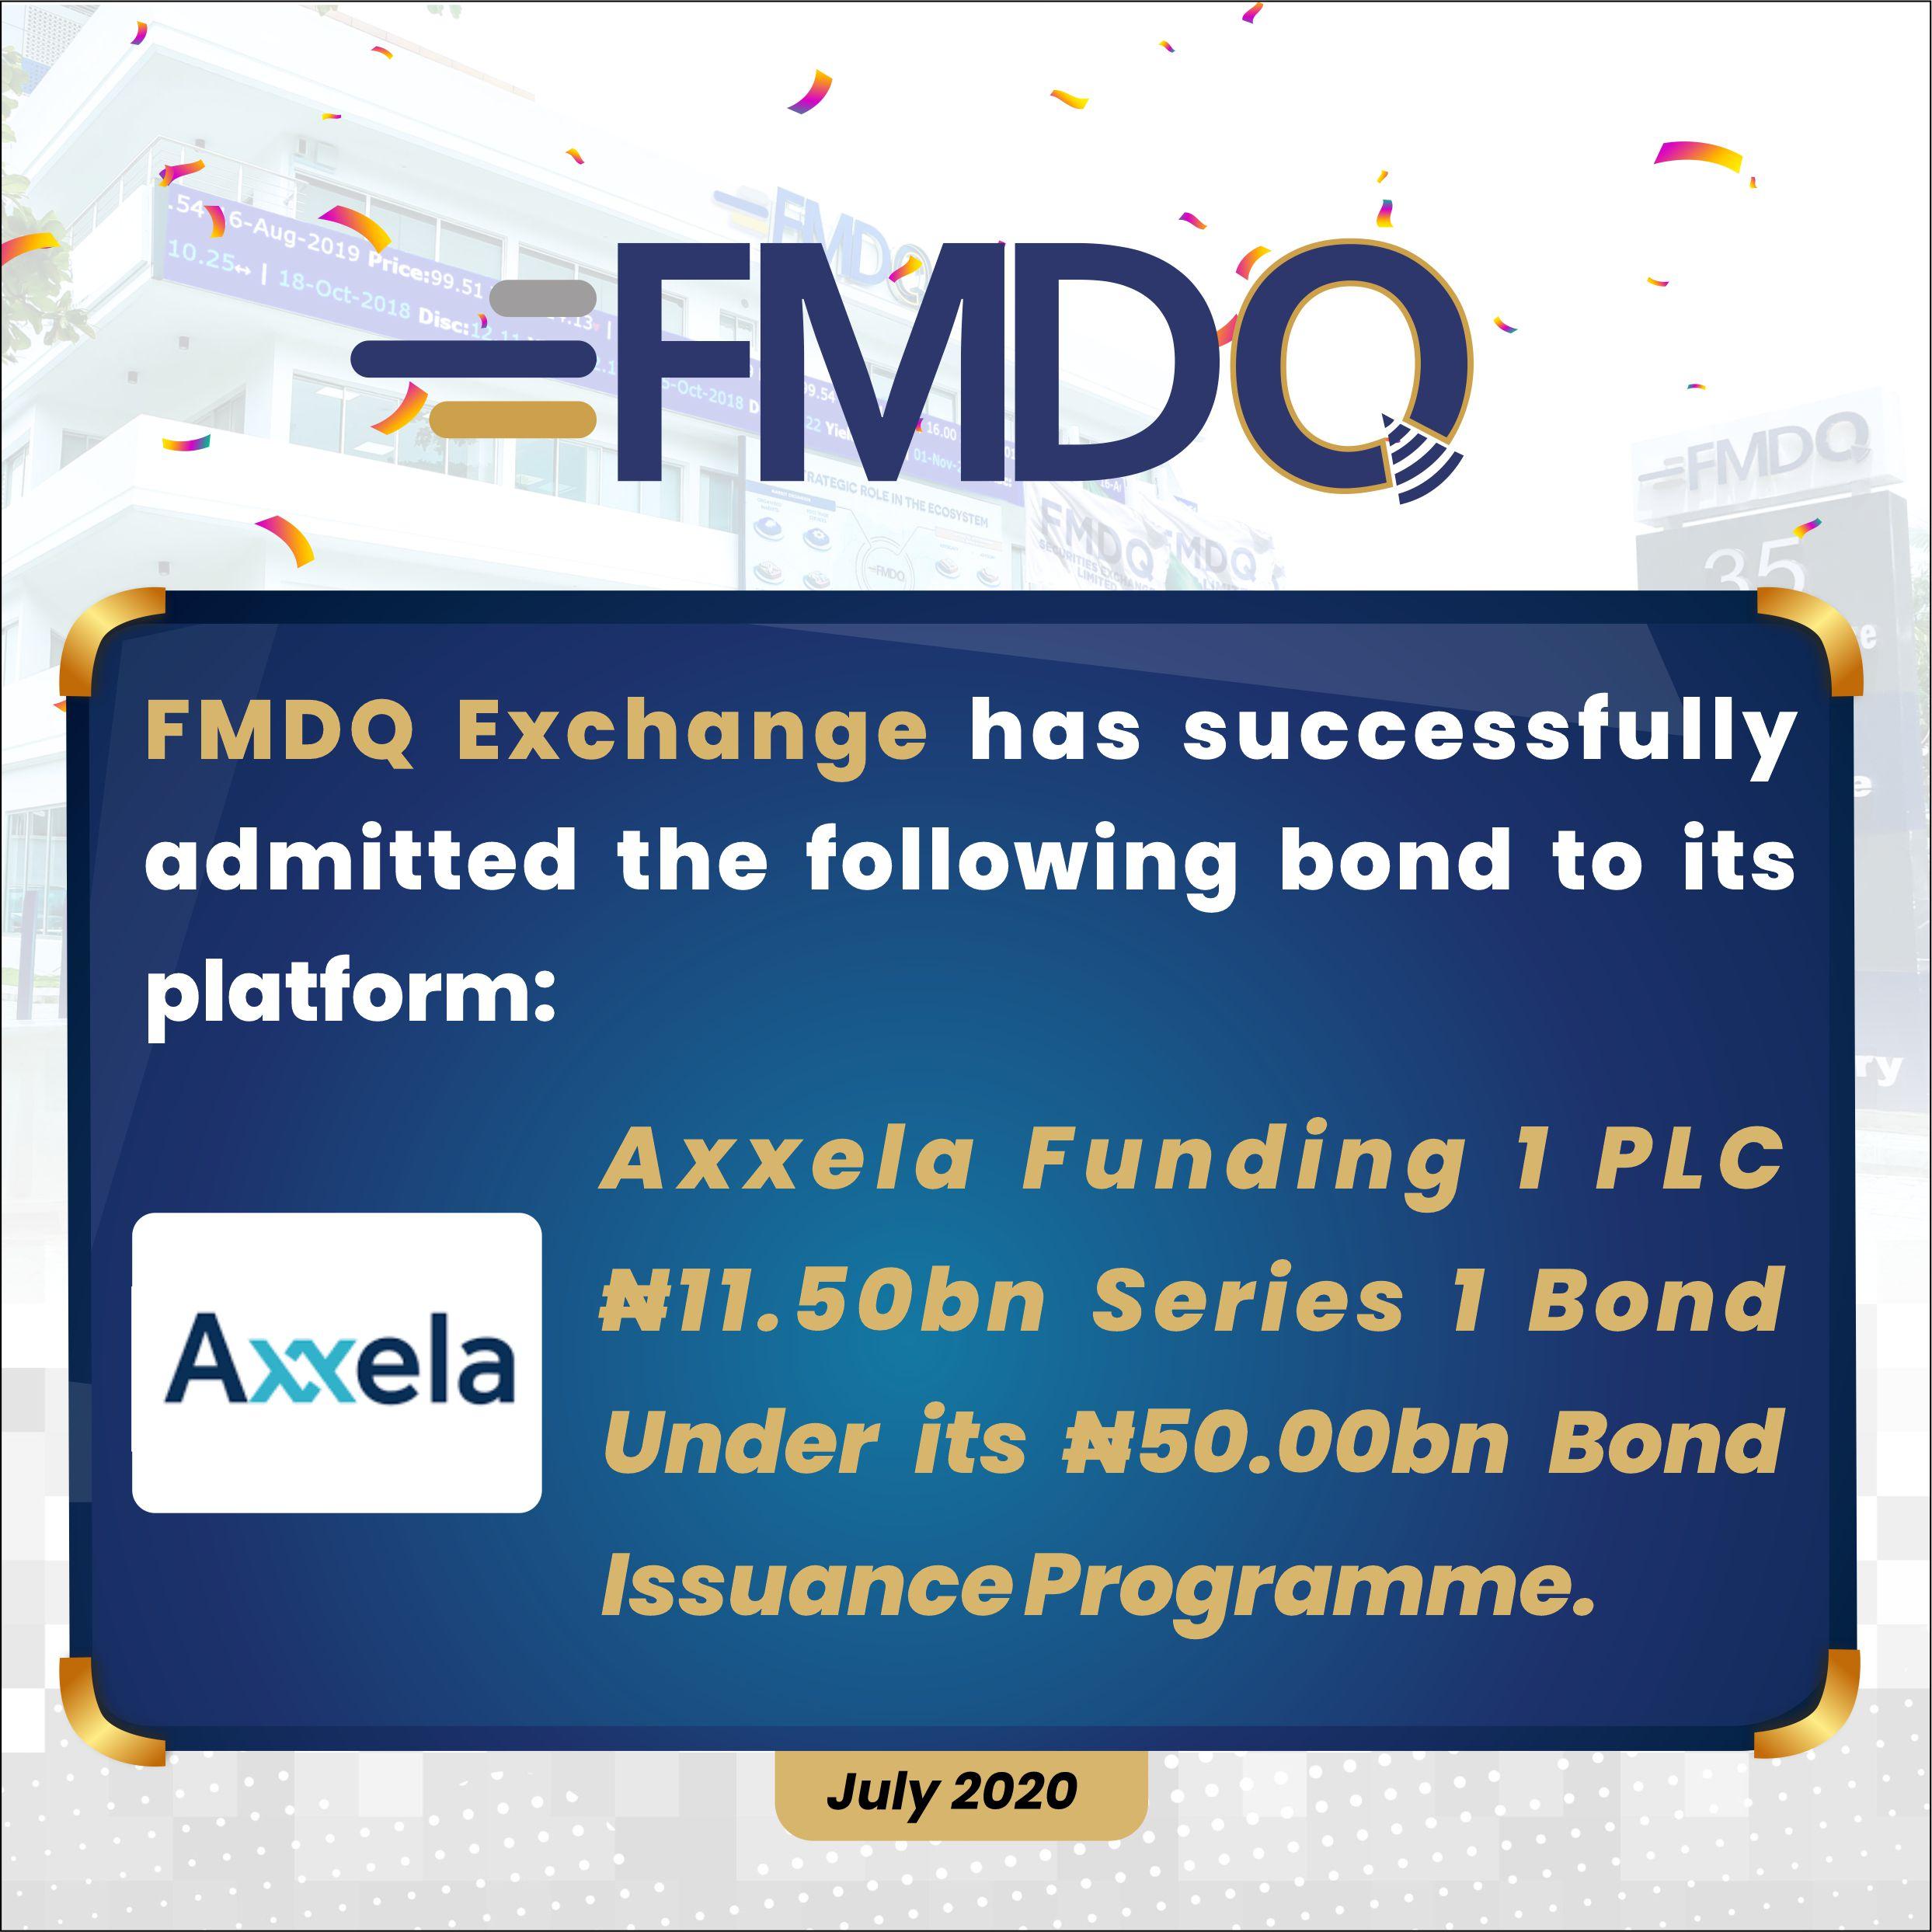 FMDQ Exchange Admits Axxela Funding 1 PLC Series 1 Bond - Brand Spur